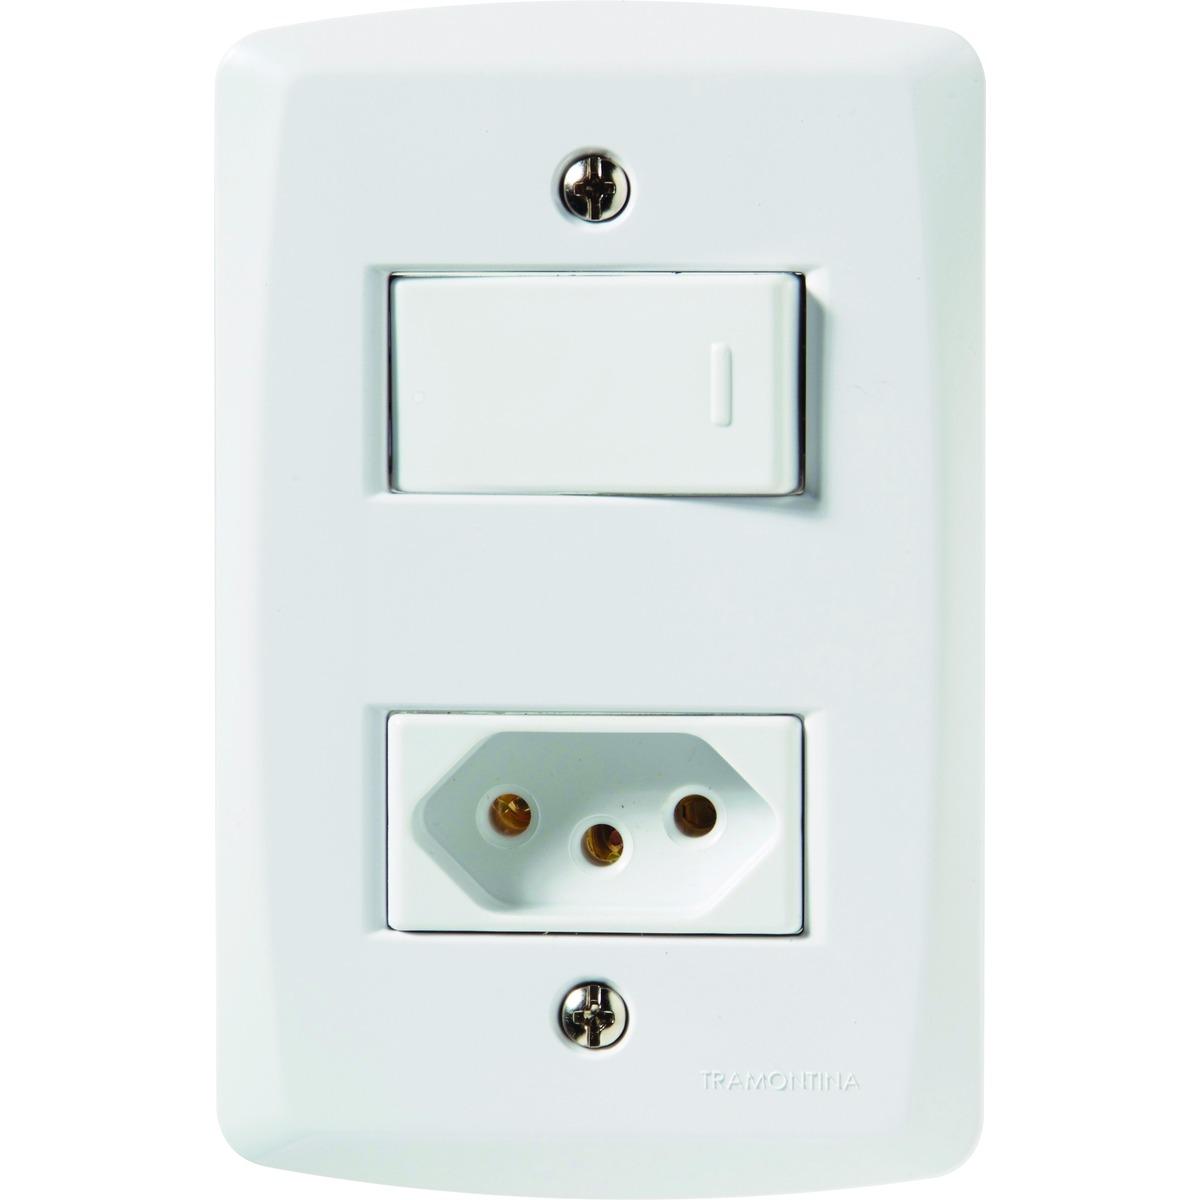 Interruptor Par/Tom 2P+T 10A/250V Lux2 57145/050 Tramontina